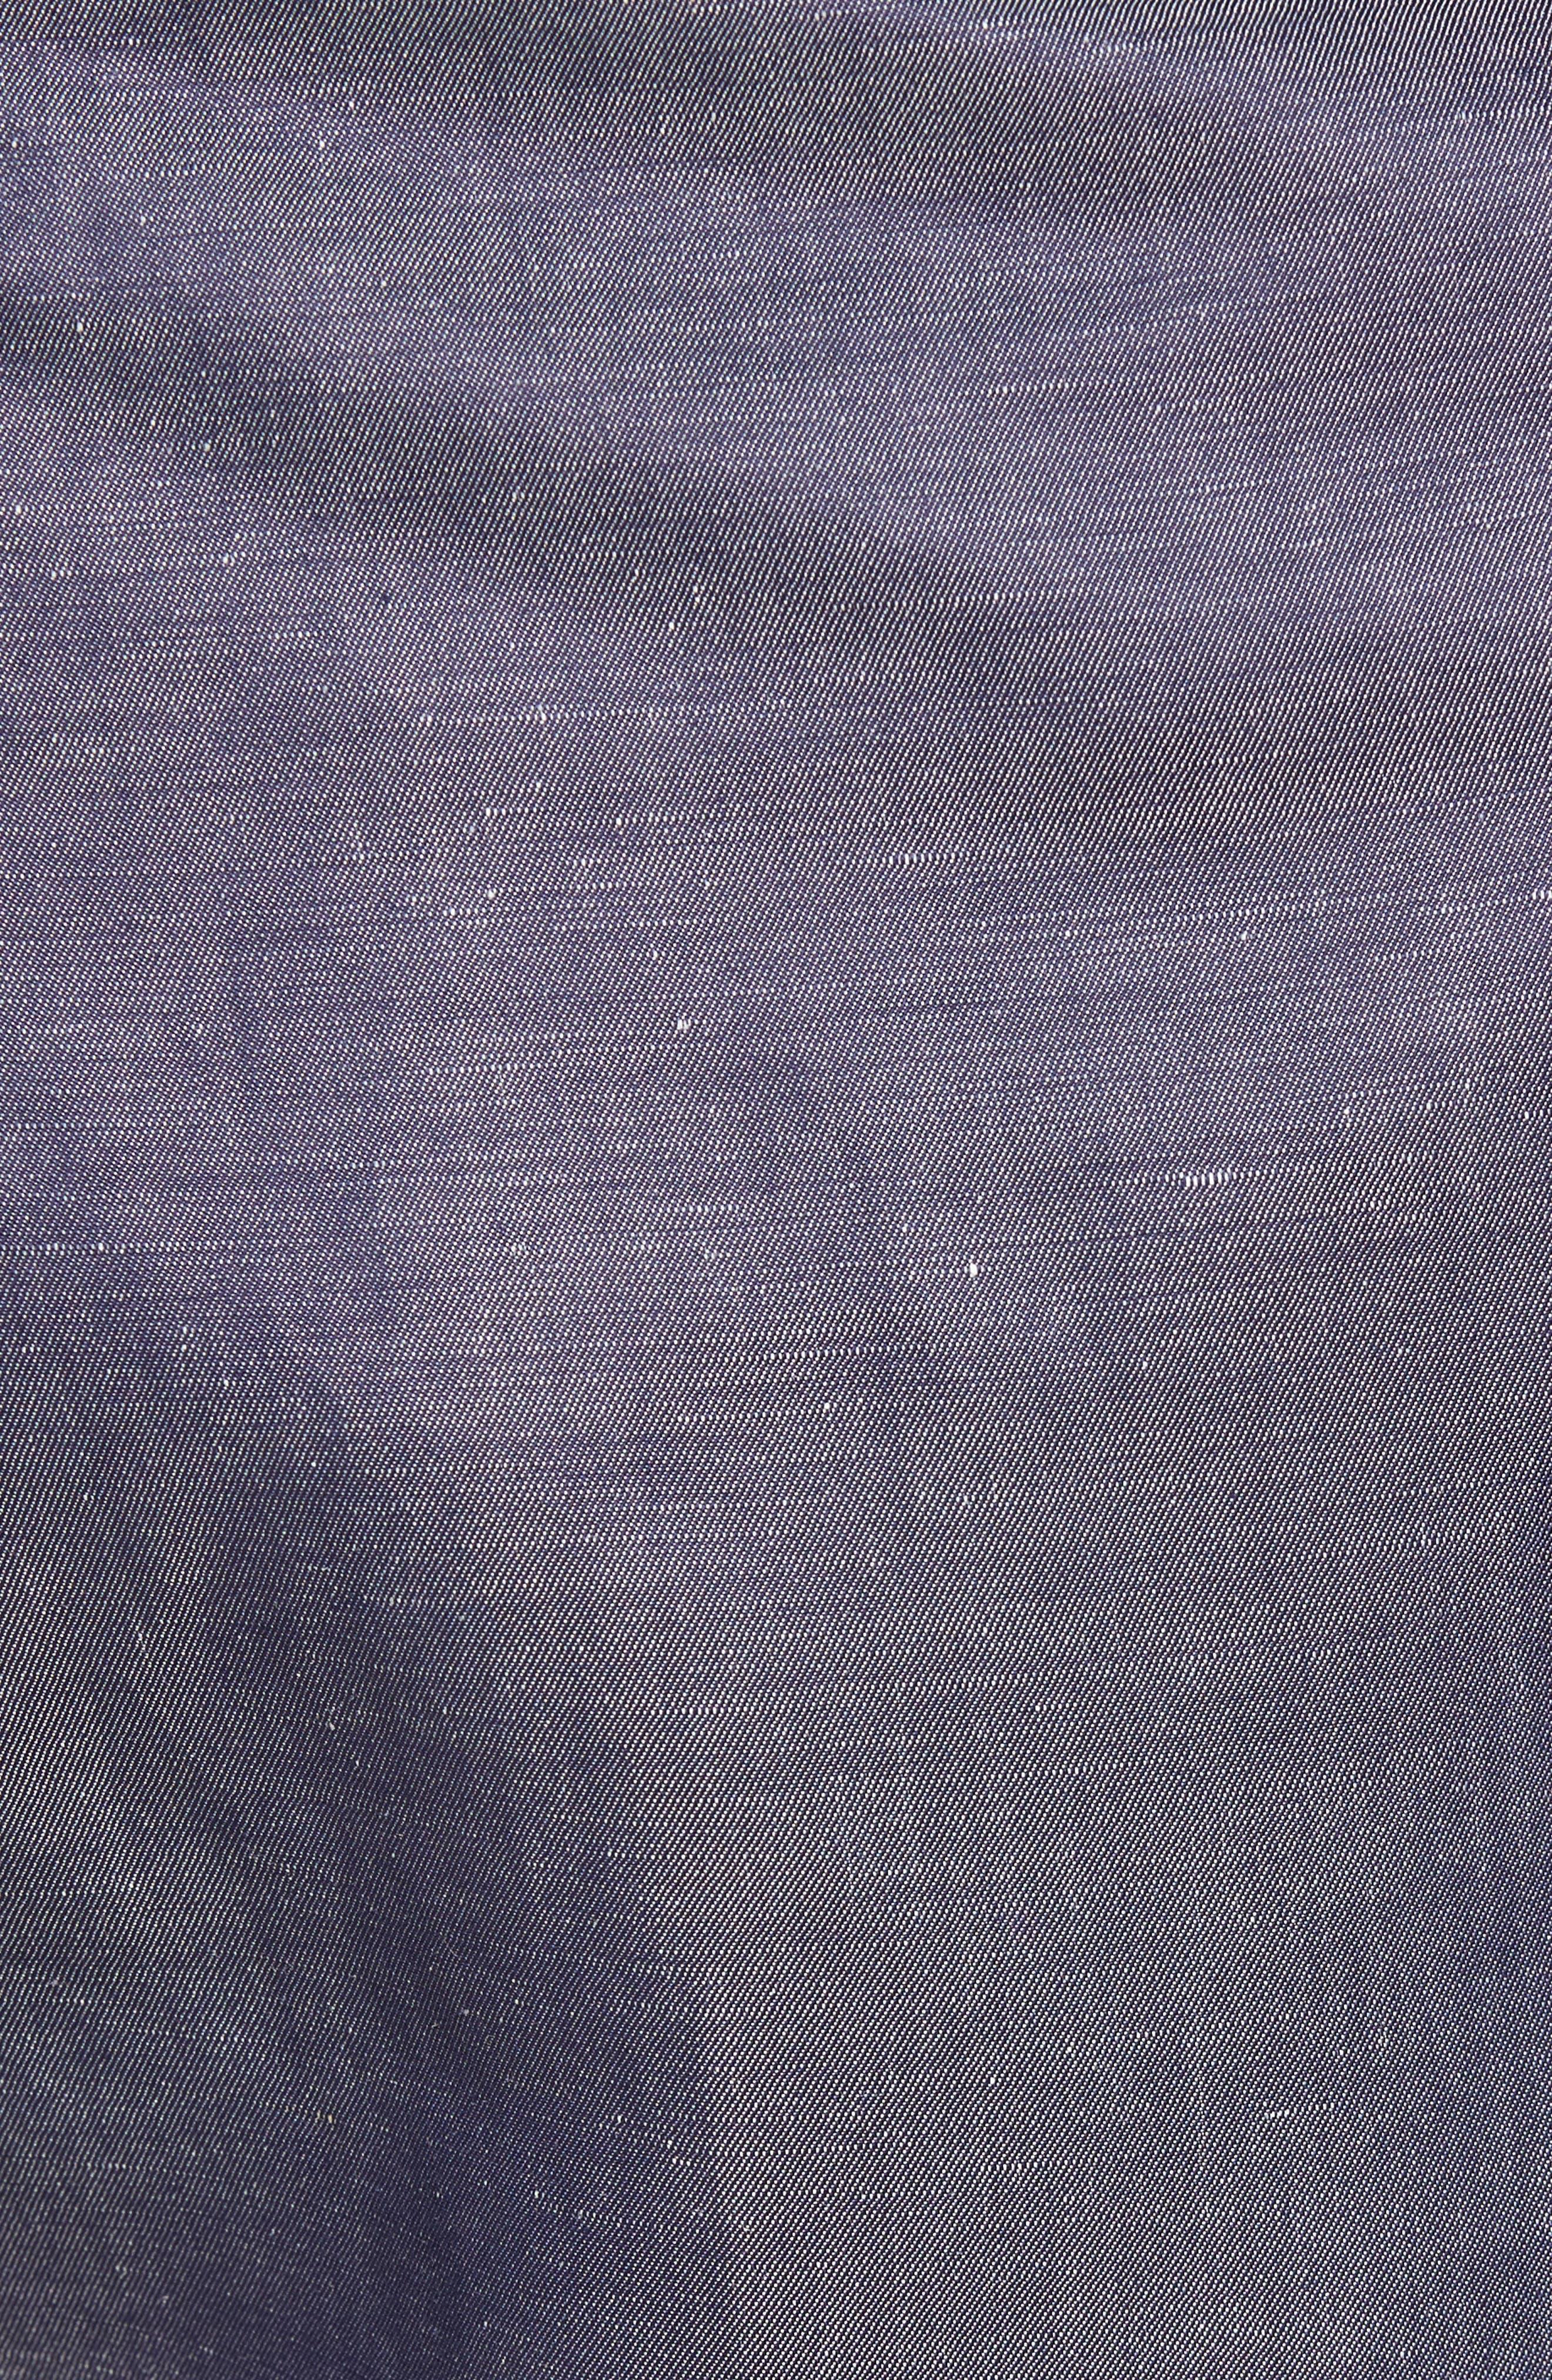 Linen Blend Bermuda Shorts,                             Alternate thumbnail 5, color,                             Blue Jean